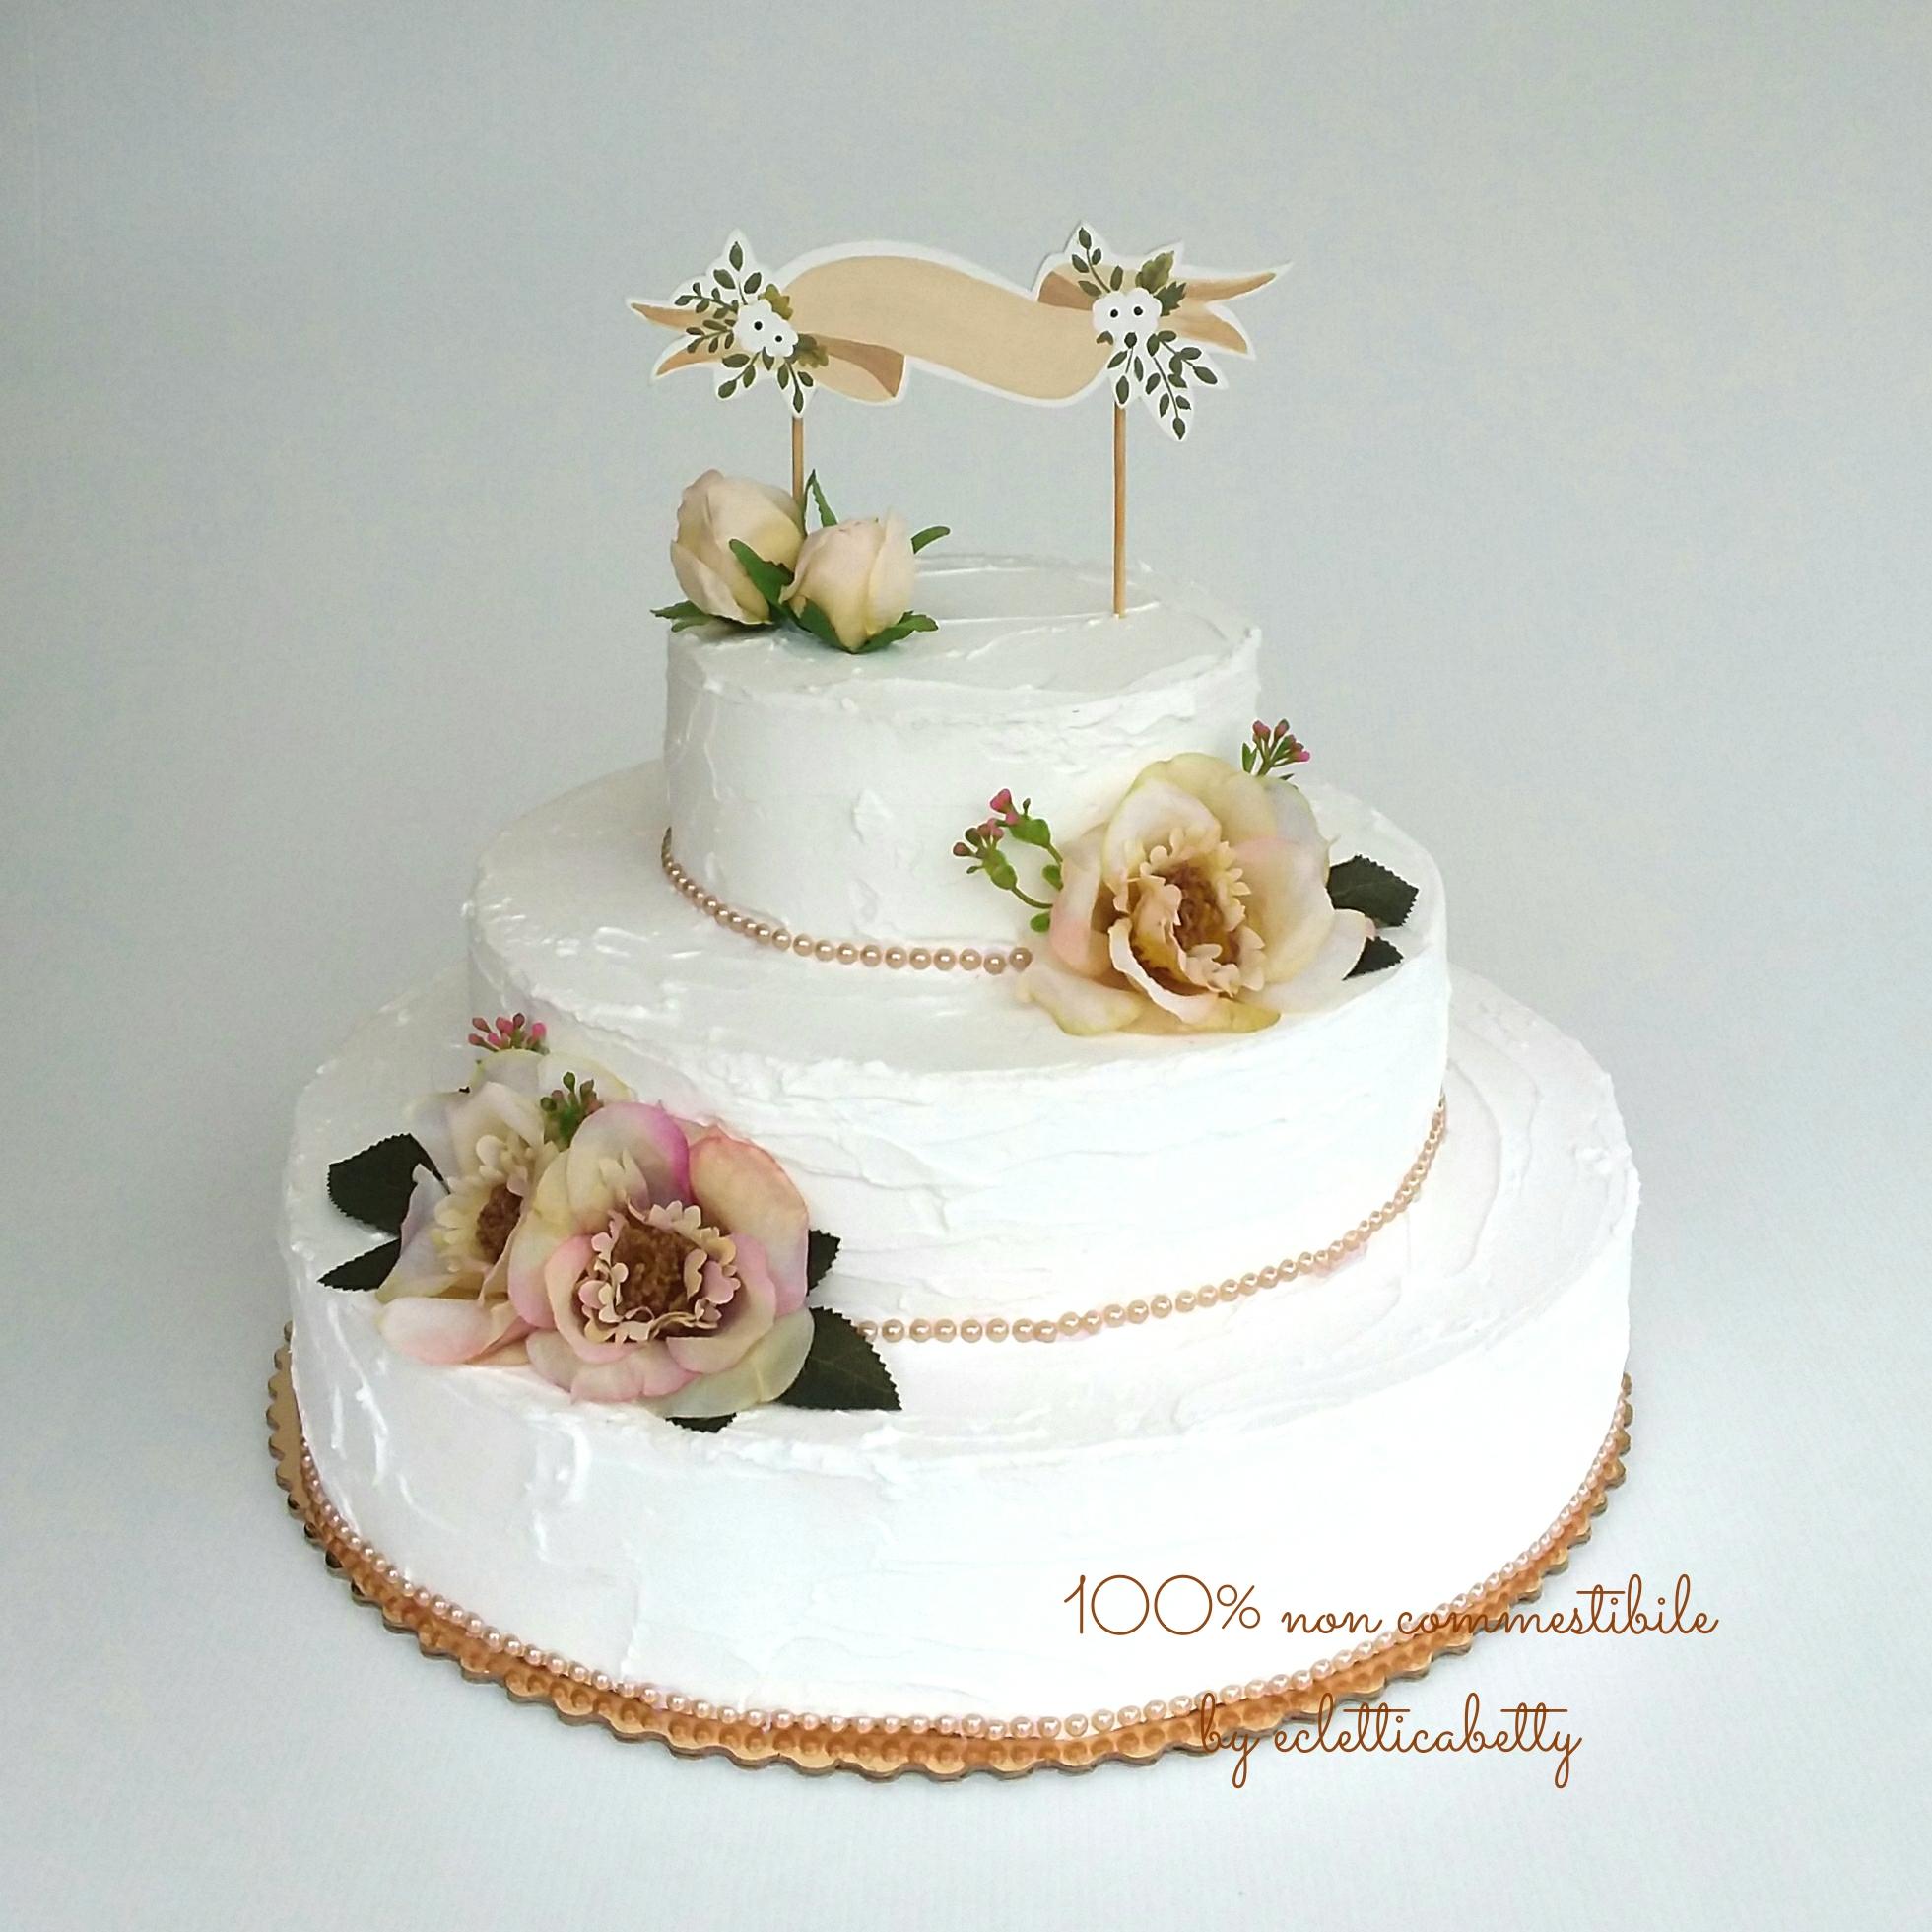 Shabby Wedding Cake Bianca Con Fiori Miele Ecletticabetty